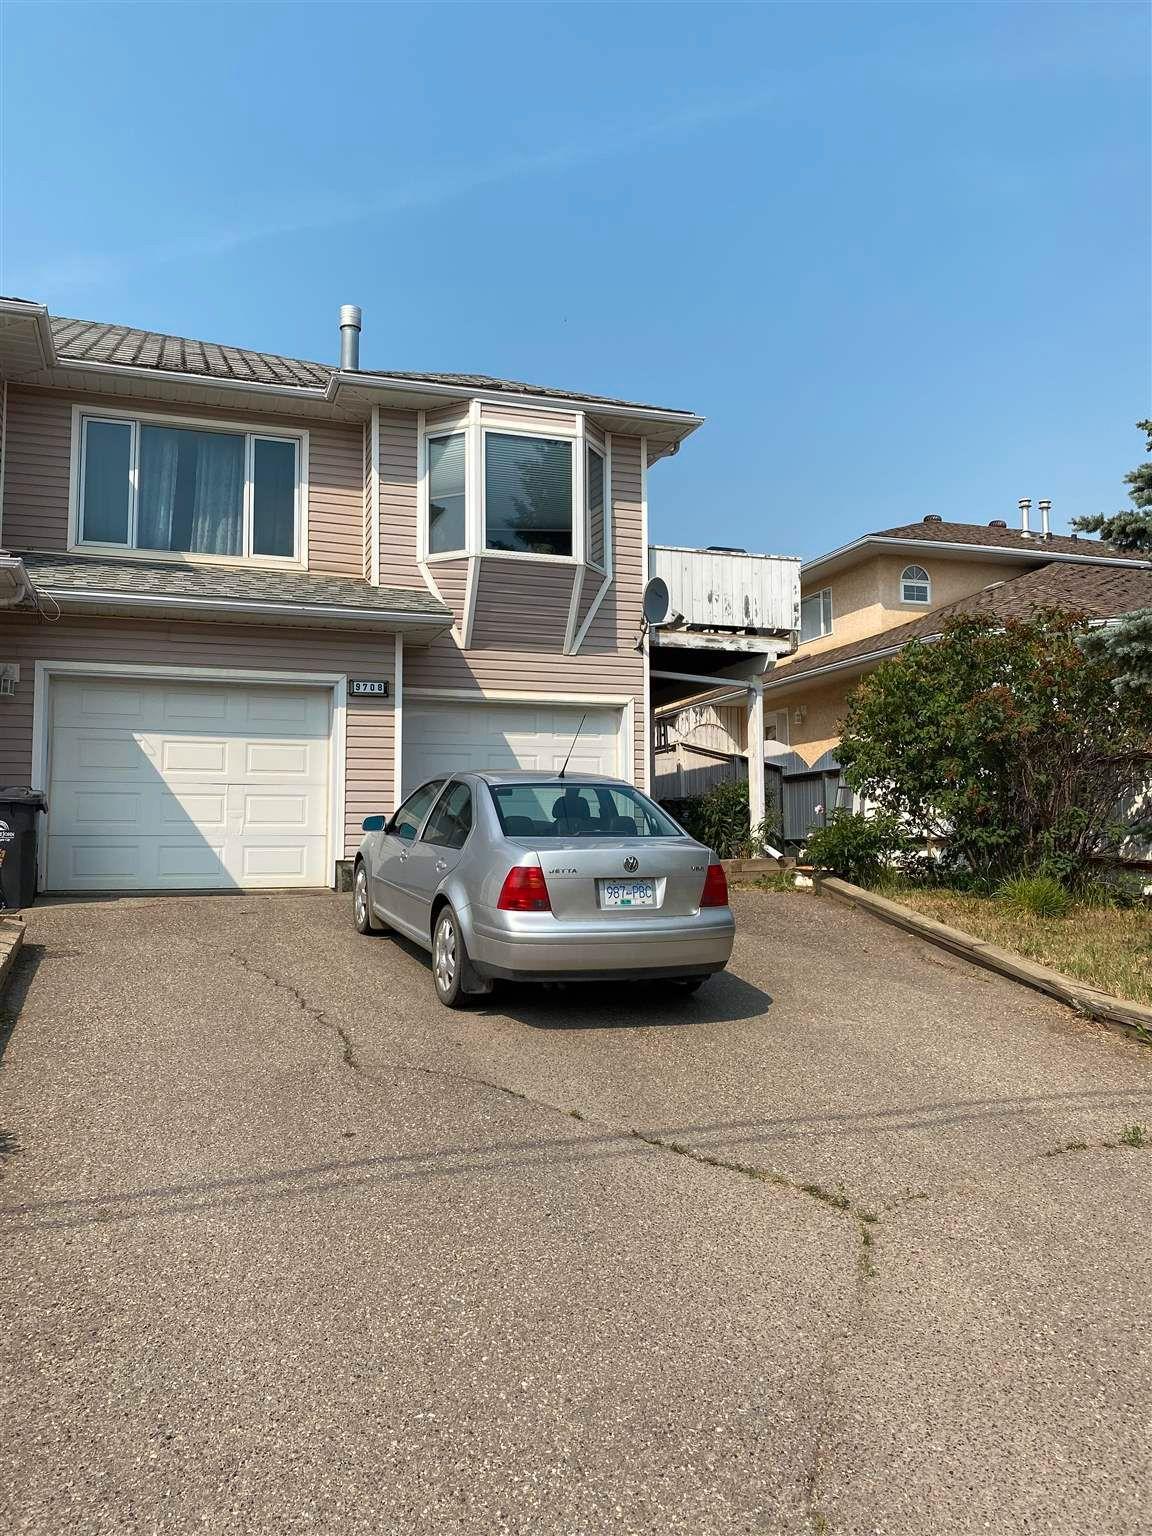 Main Photo: 9708 98A Avenue in Fort St. John: Fort St. John - City SE 1/2 Duplex for sale (Fort St. John (Zone 60))  : MLS®# R2601828